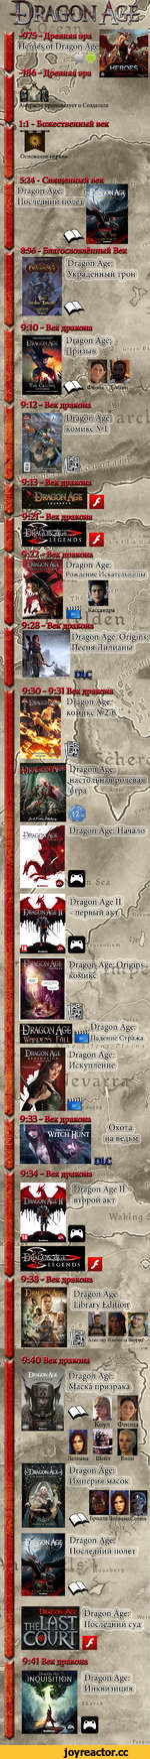 I I AN I M IRC III f HE Caluhc, ~*Aji «limite bitto*f.Hiran REDEMPTION mu~ HlltlA DAY Heroes 0Ï Dragon Age о Создателе Основание ¿ill Dragon Age: Щ Последний полет Dragon Age: Украденный трон Dragon Age Призыв Фиона Dragon Age:Д^ Рождение Искательницы bocks Dragon Age: Orij t '